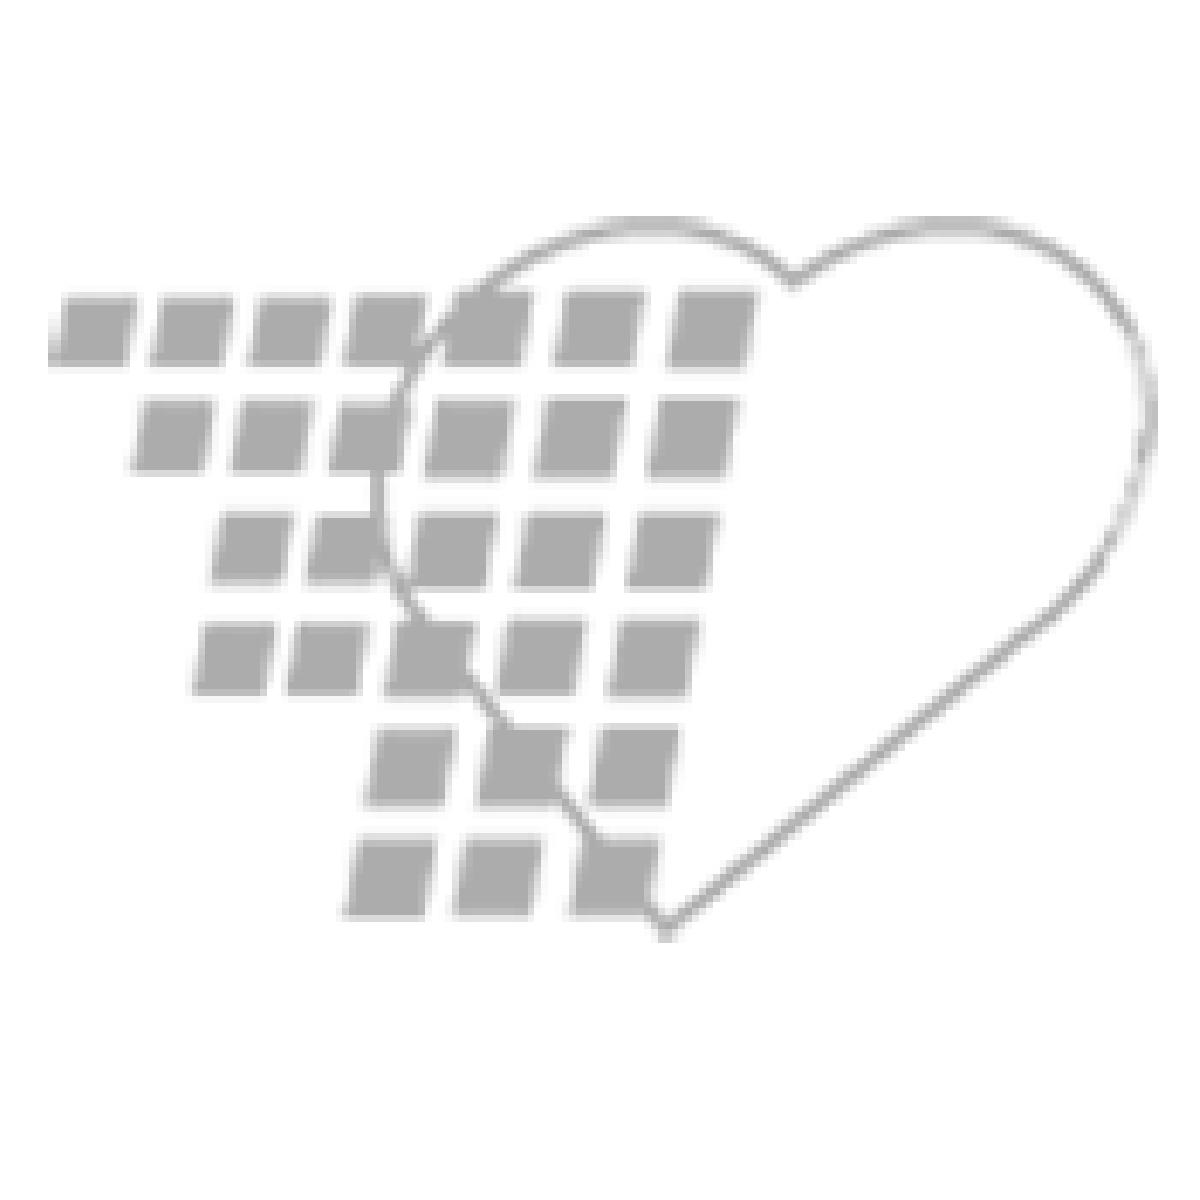 "06-21-5838 Saf-T-Intima Winged IV Catheter - 22G x 3/4"""